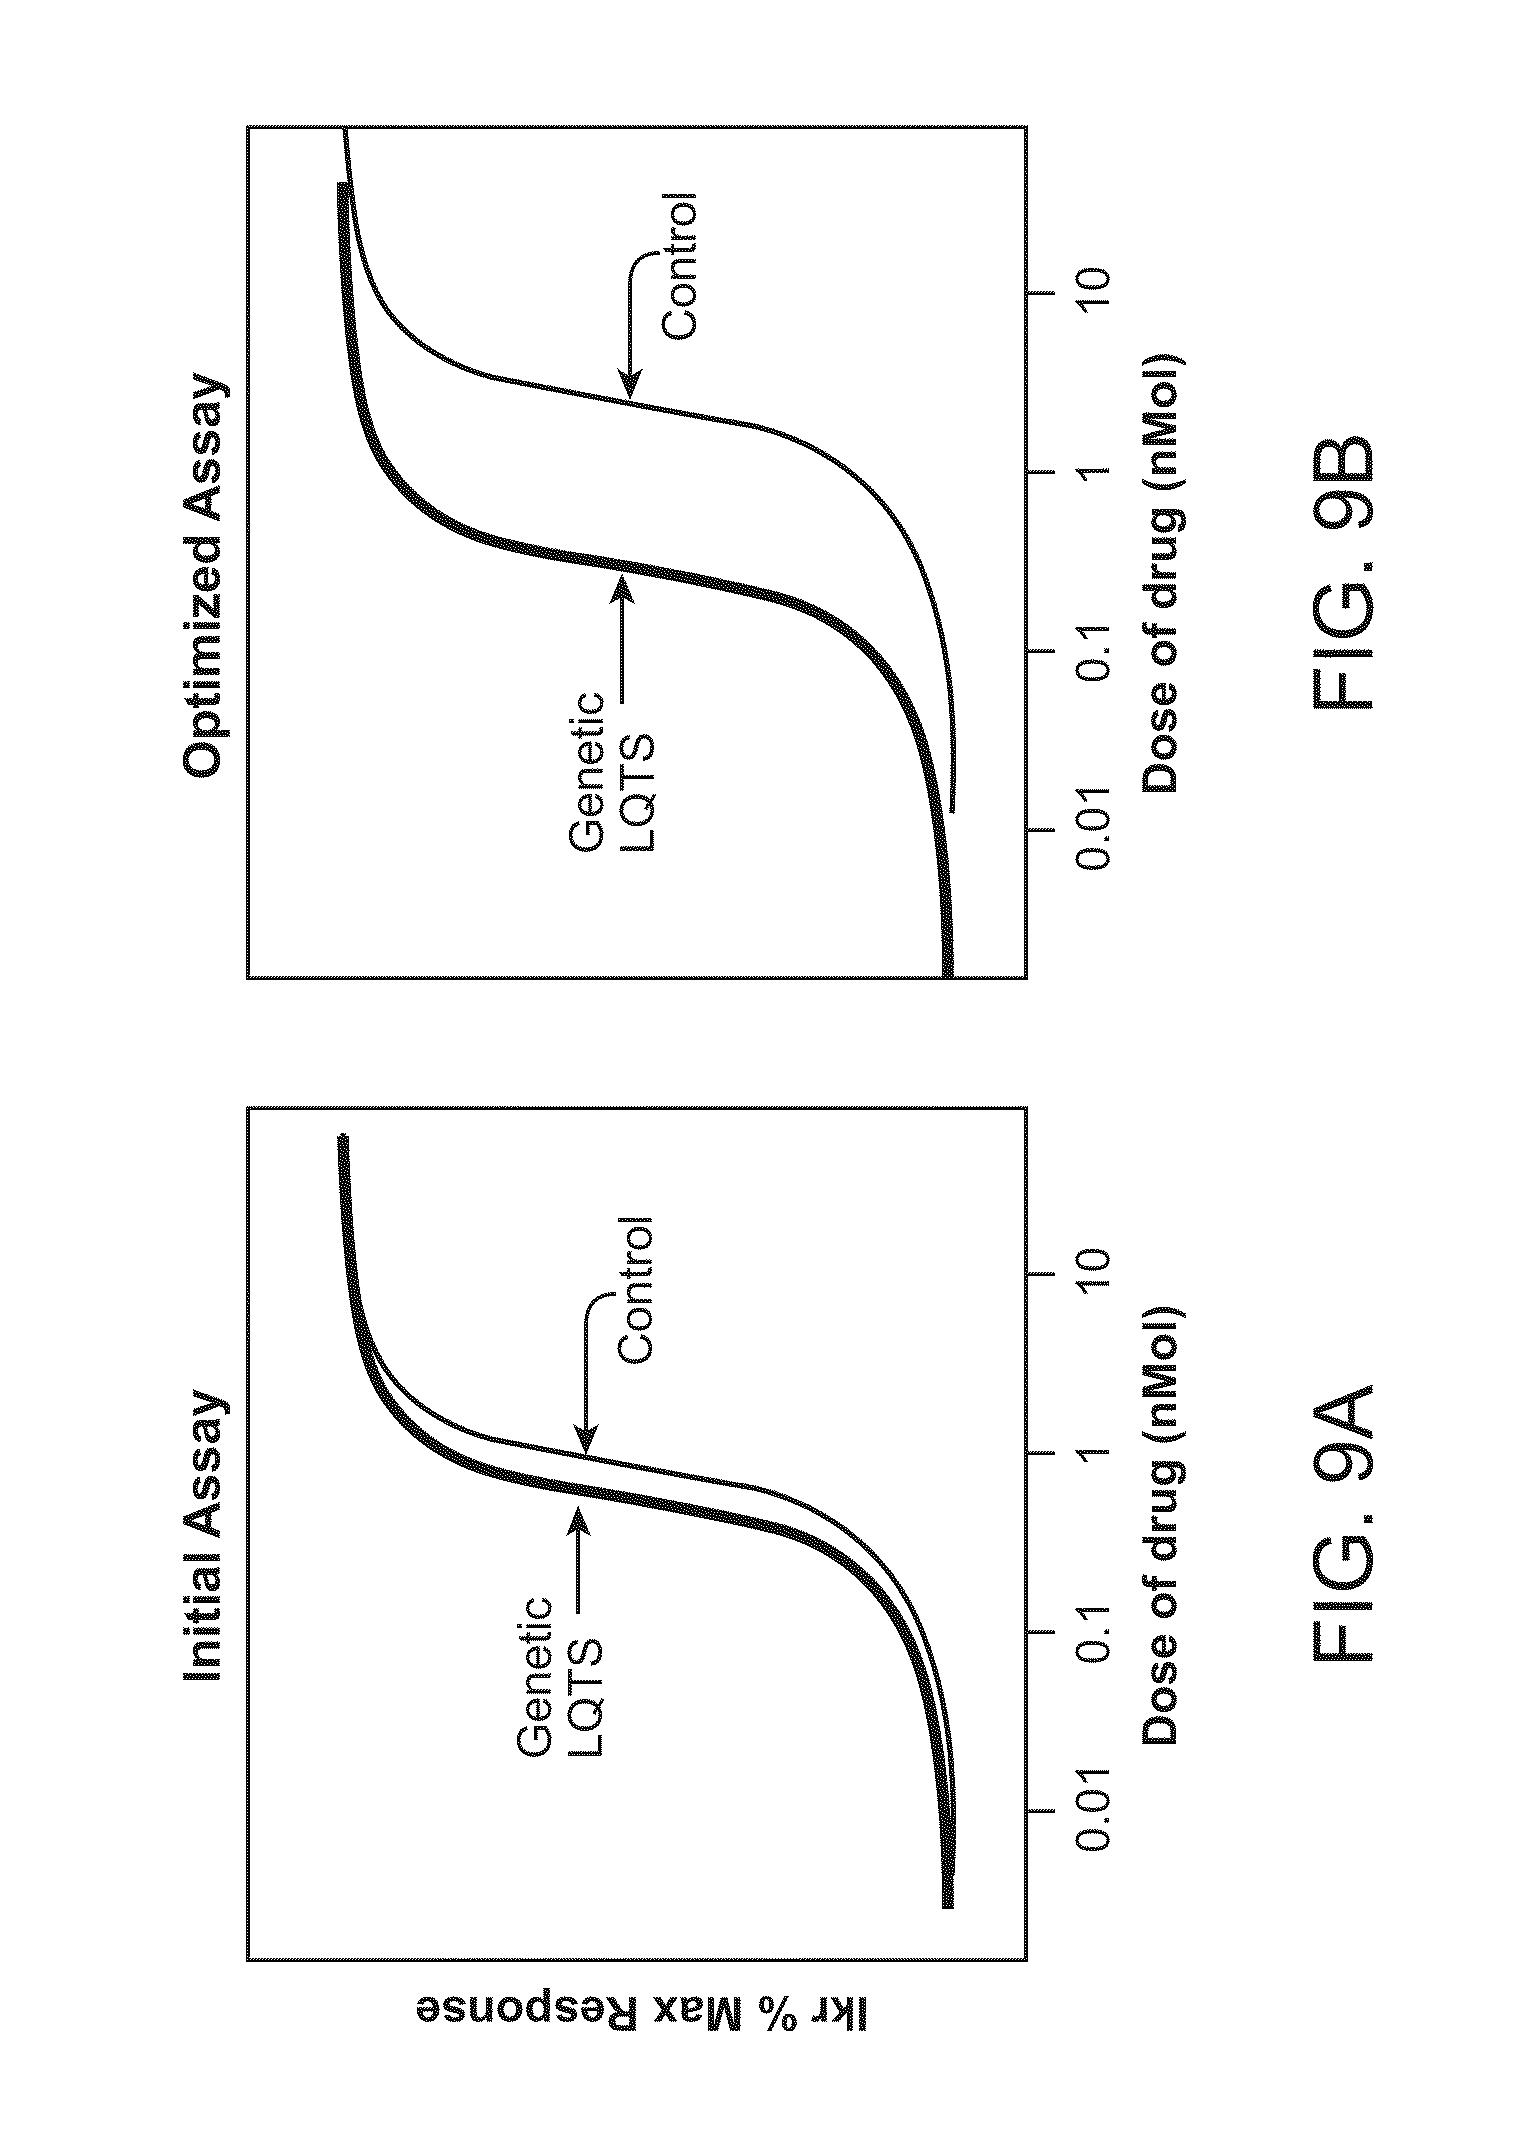 prednisone tapering schedule